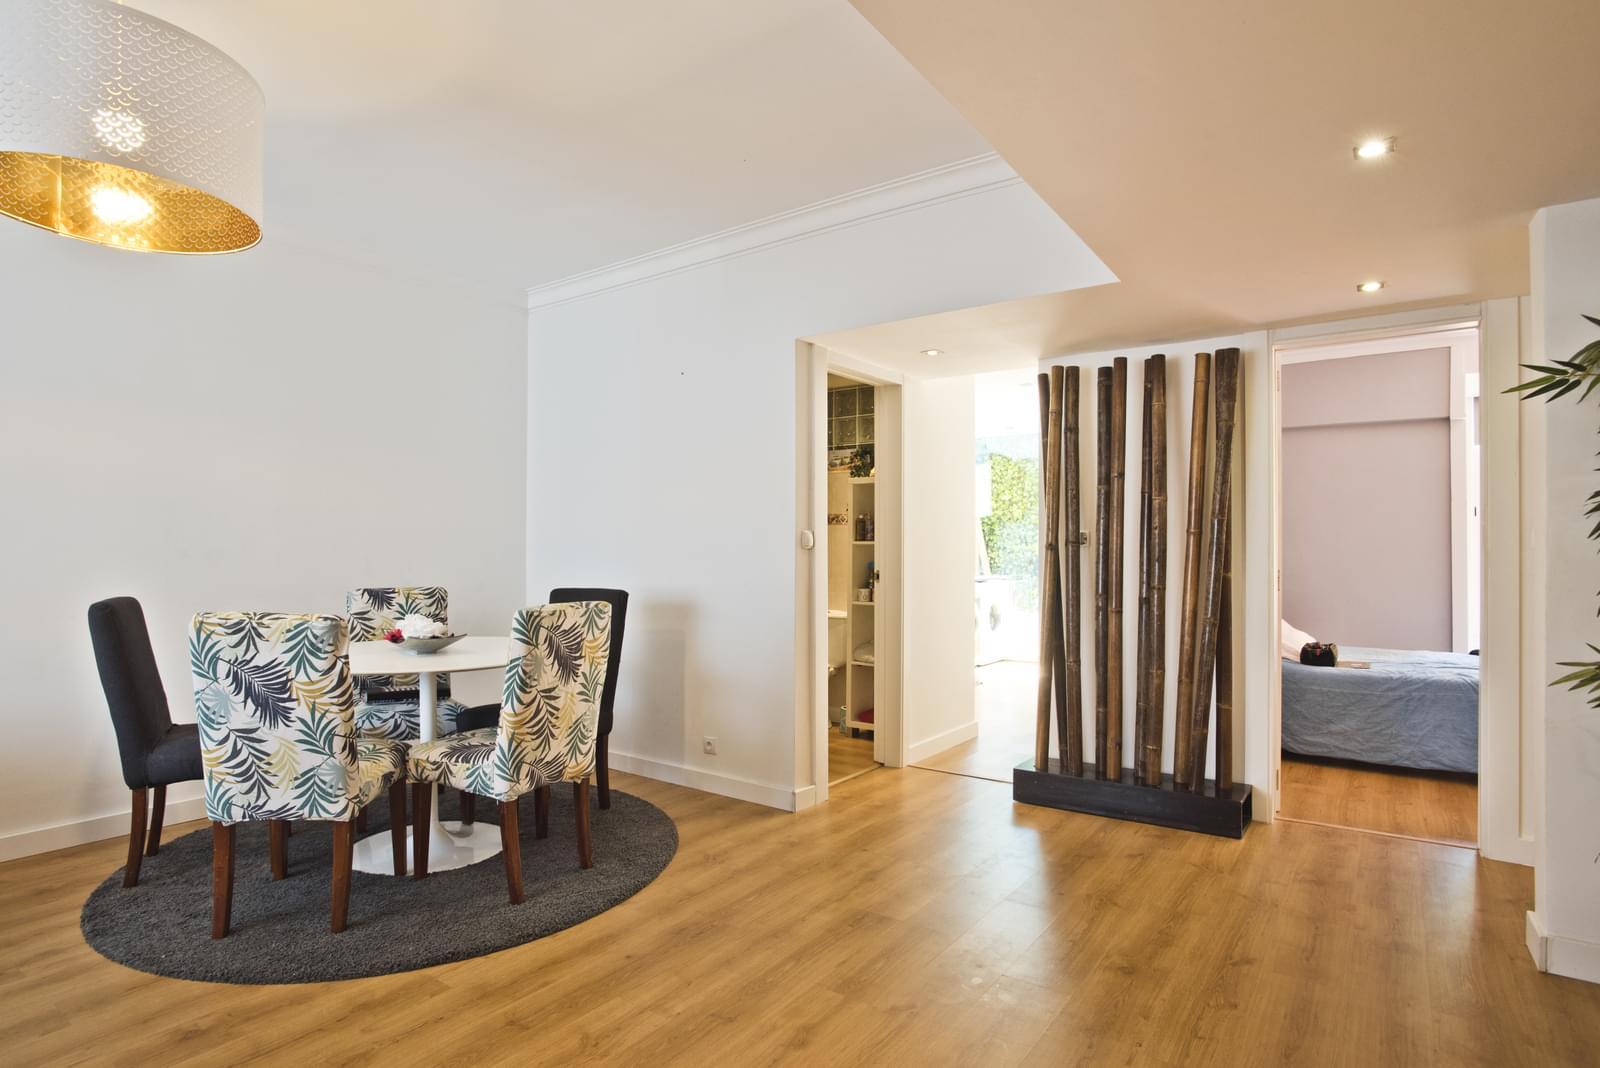 pf17010-apartamento-t4-cascais-3b046cf6-647f-468c-af39-b577a0dbd650